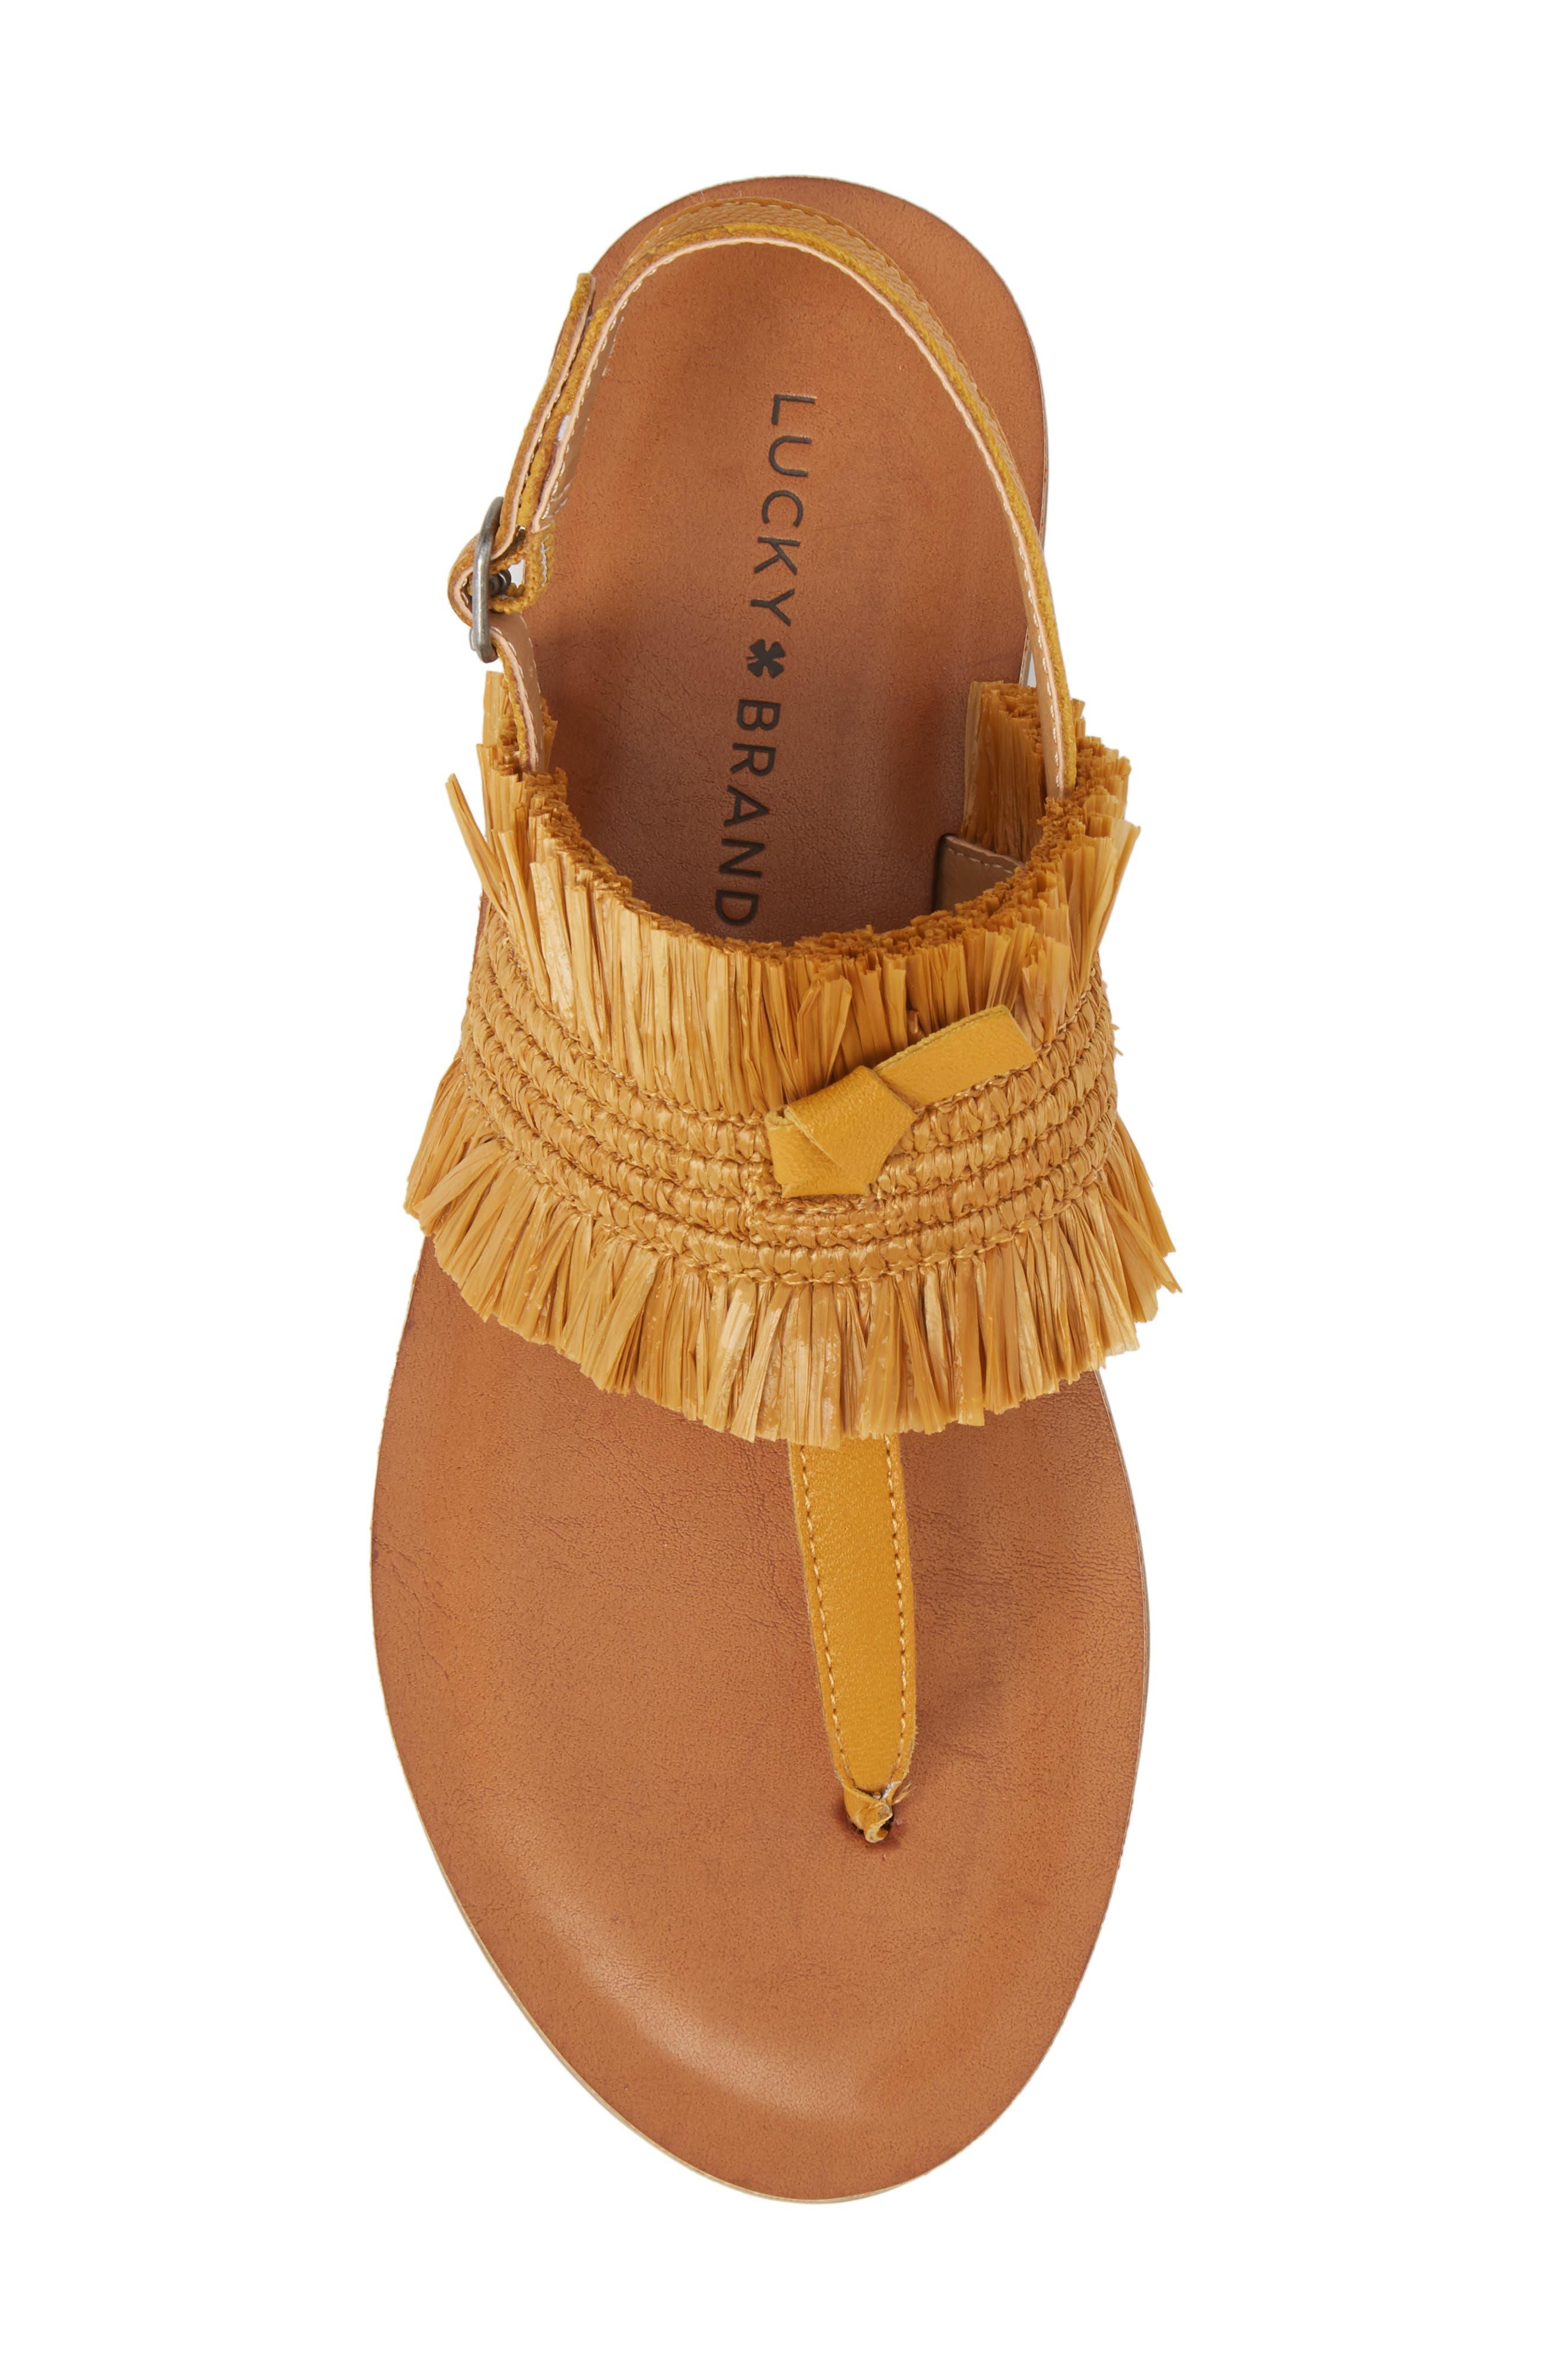 Akerlei Sandal,                             Alternate thumbnail 5, color,                             Saffron Leather